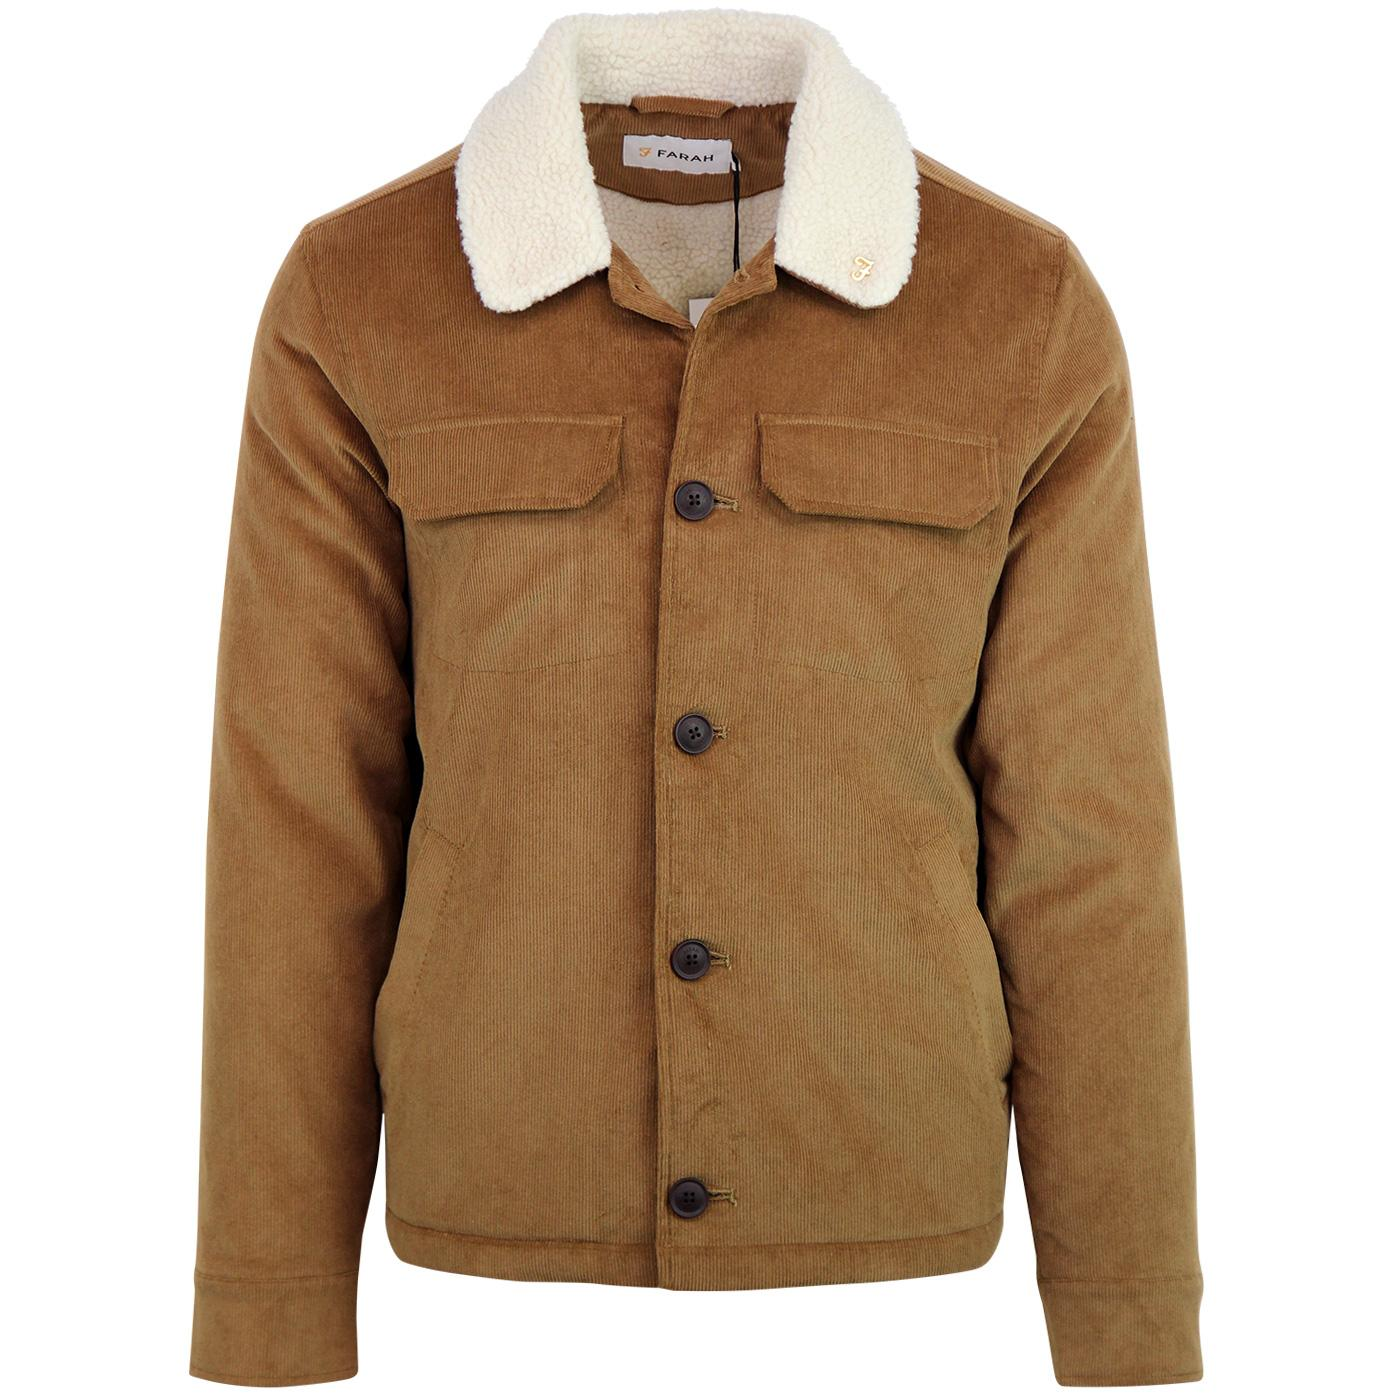 Kingsland FARAH Retro 70s Cord Sherpa Jacket C